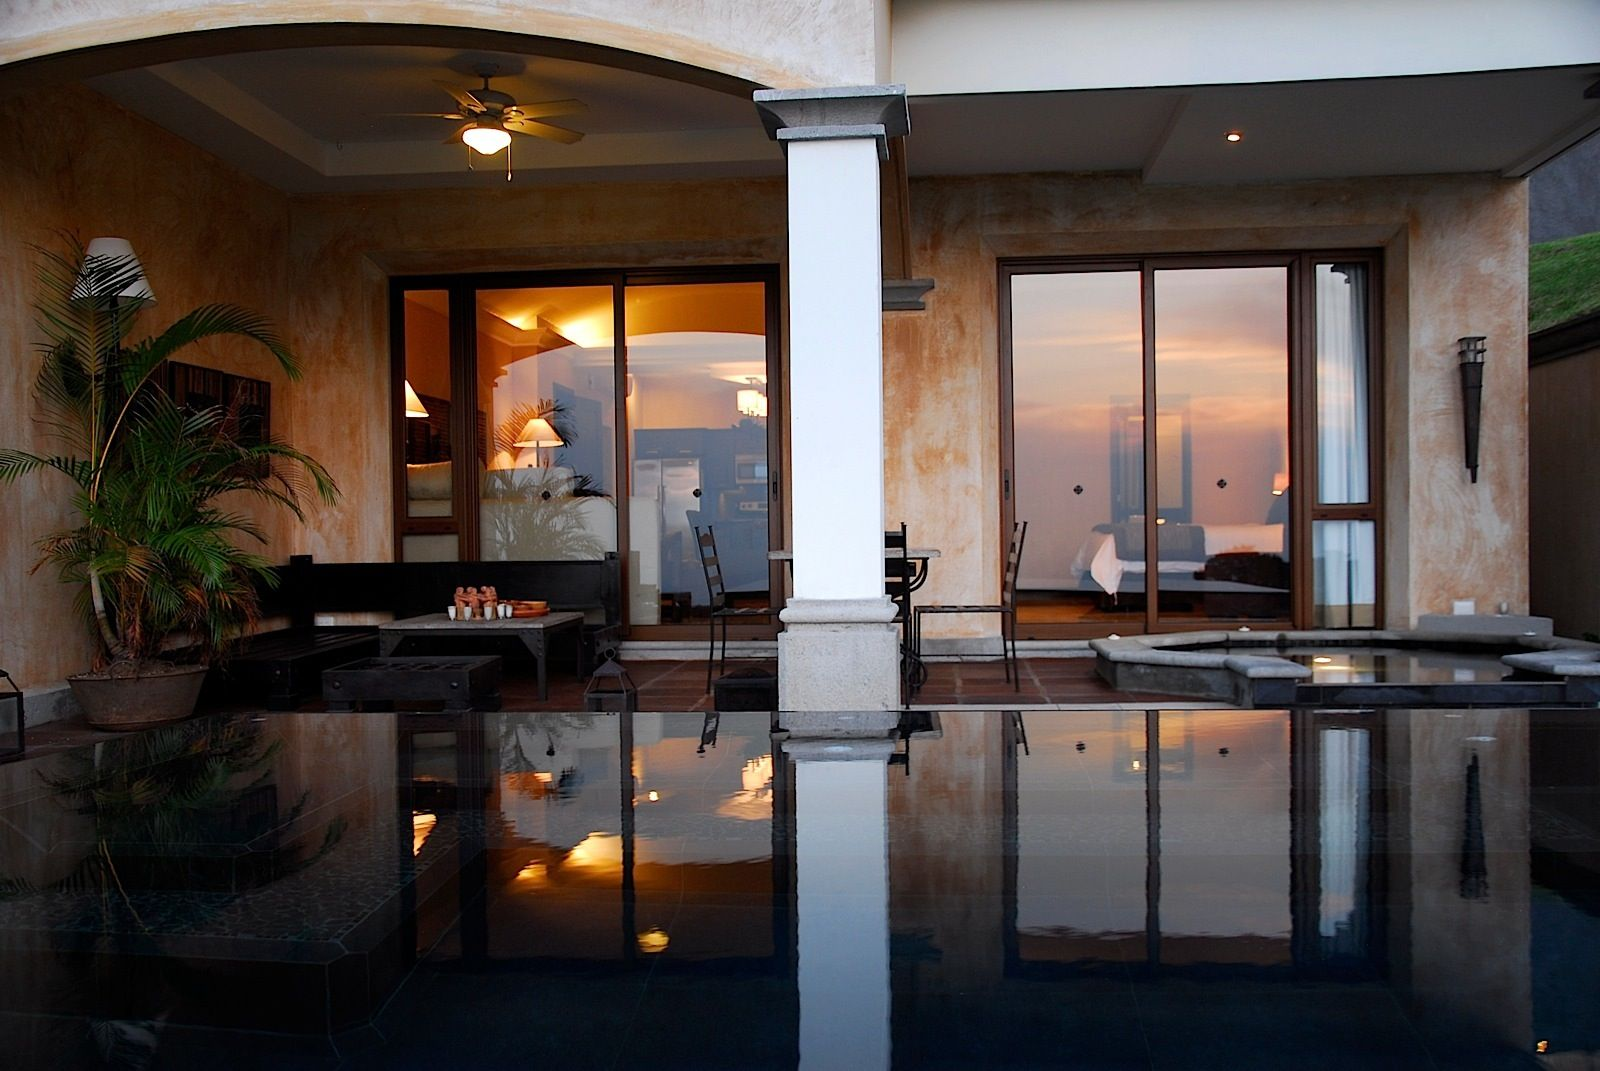 Antigua Guatemala Guatemala hotels, Hotel la, Hotel